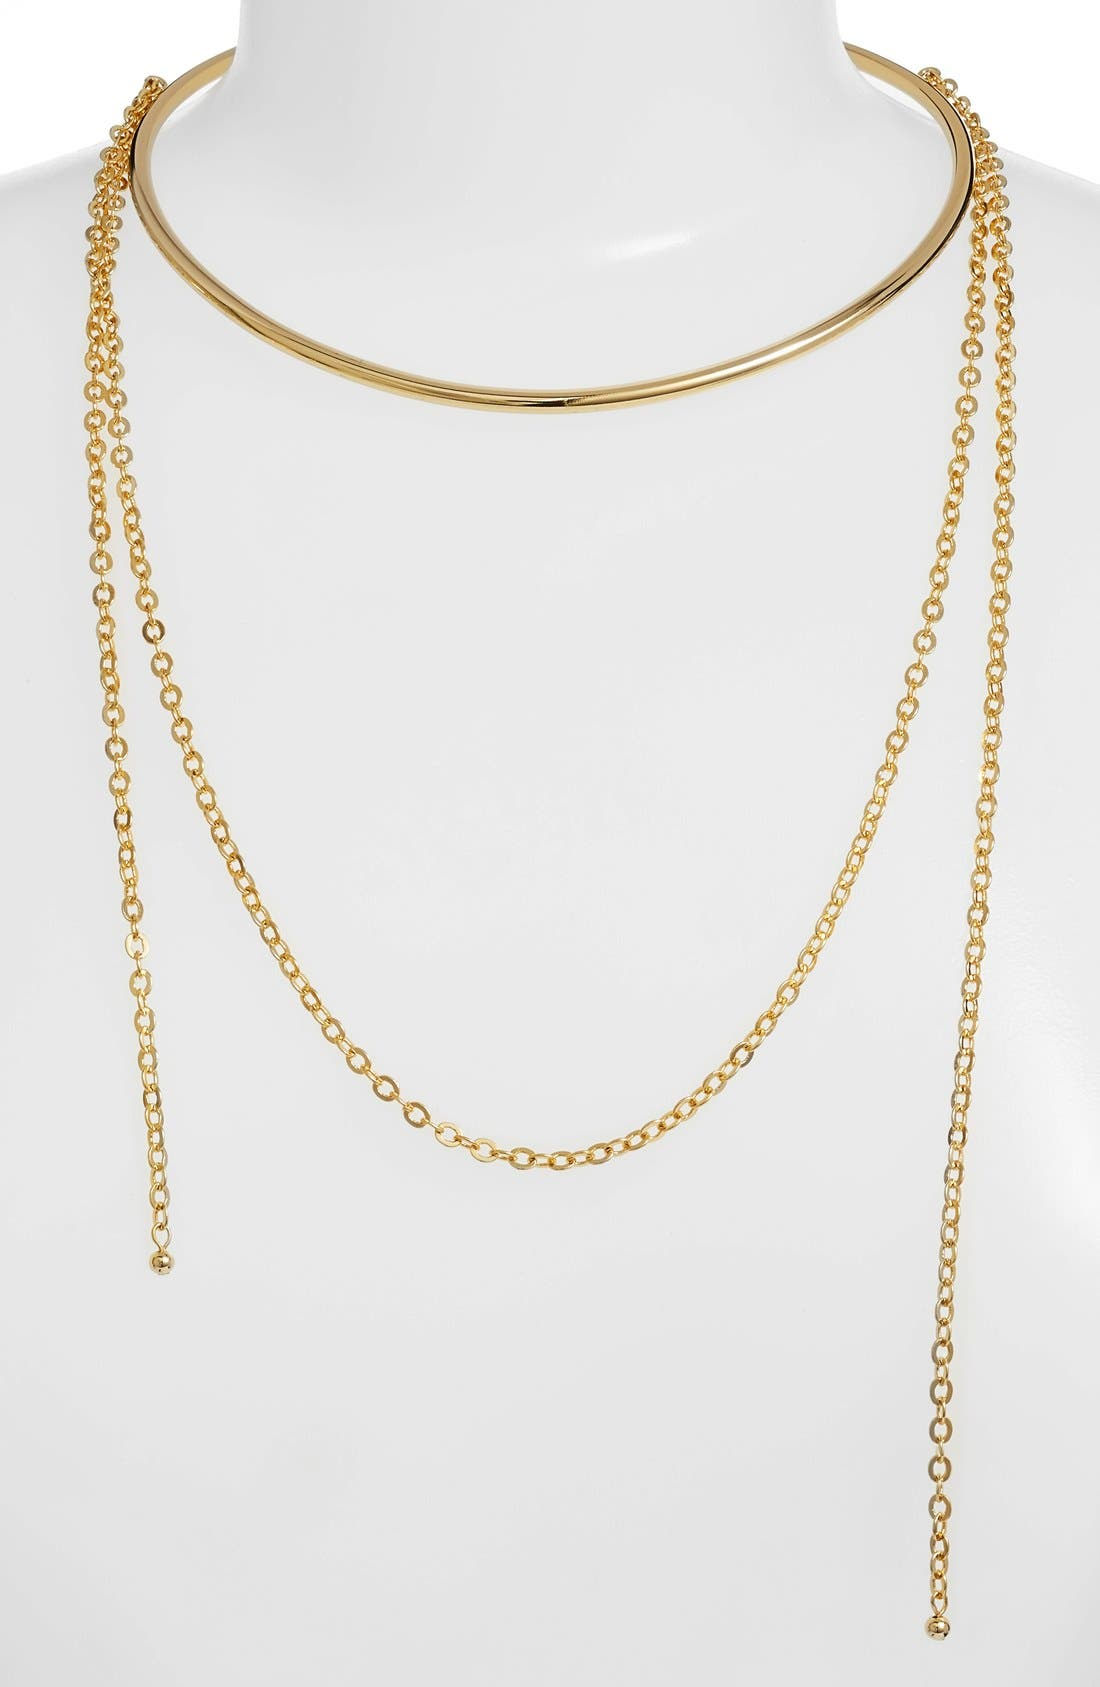 Jules Smith 'Loren' Choker Necklace